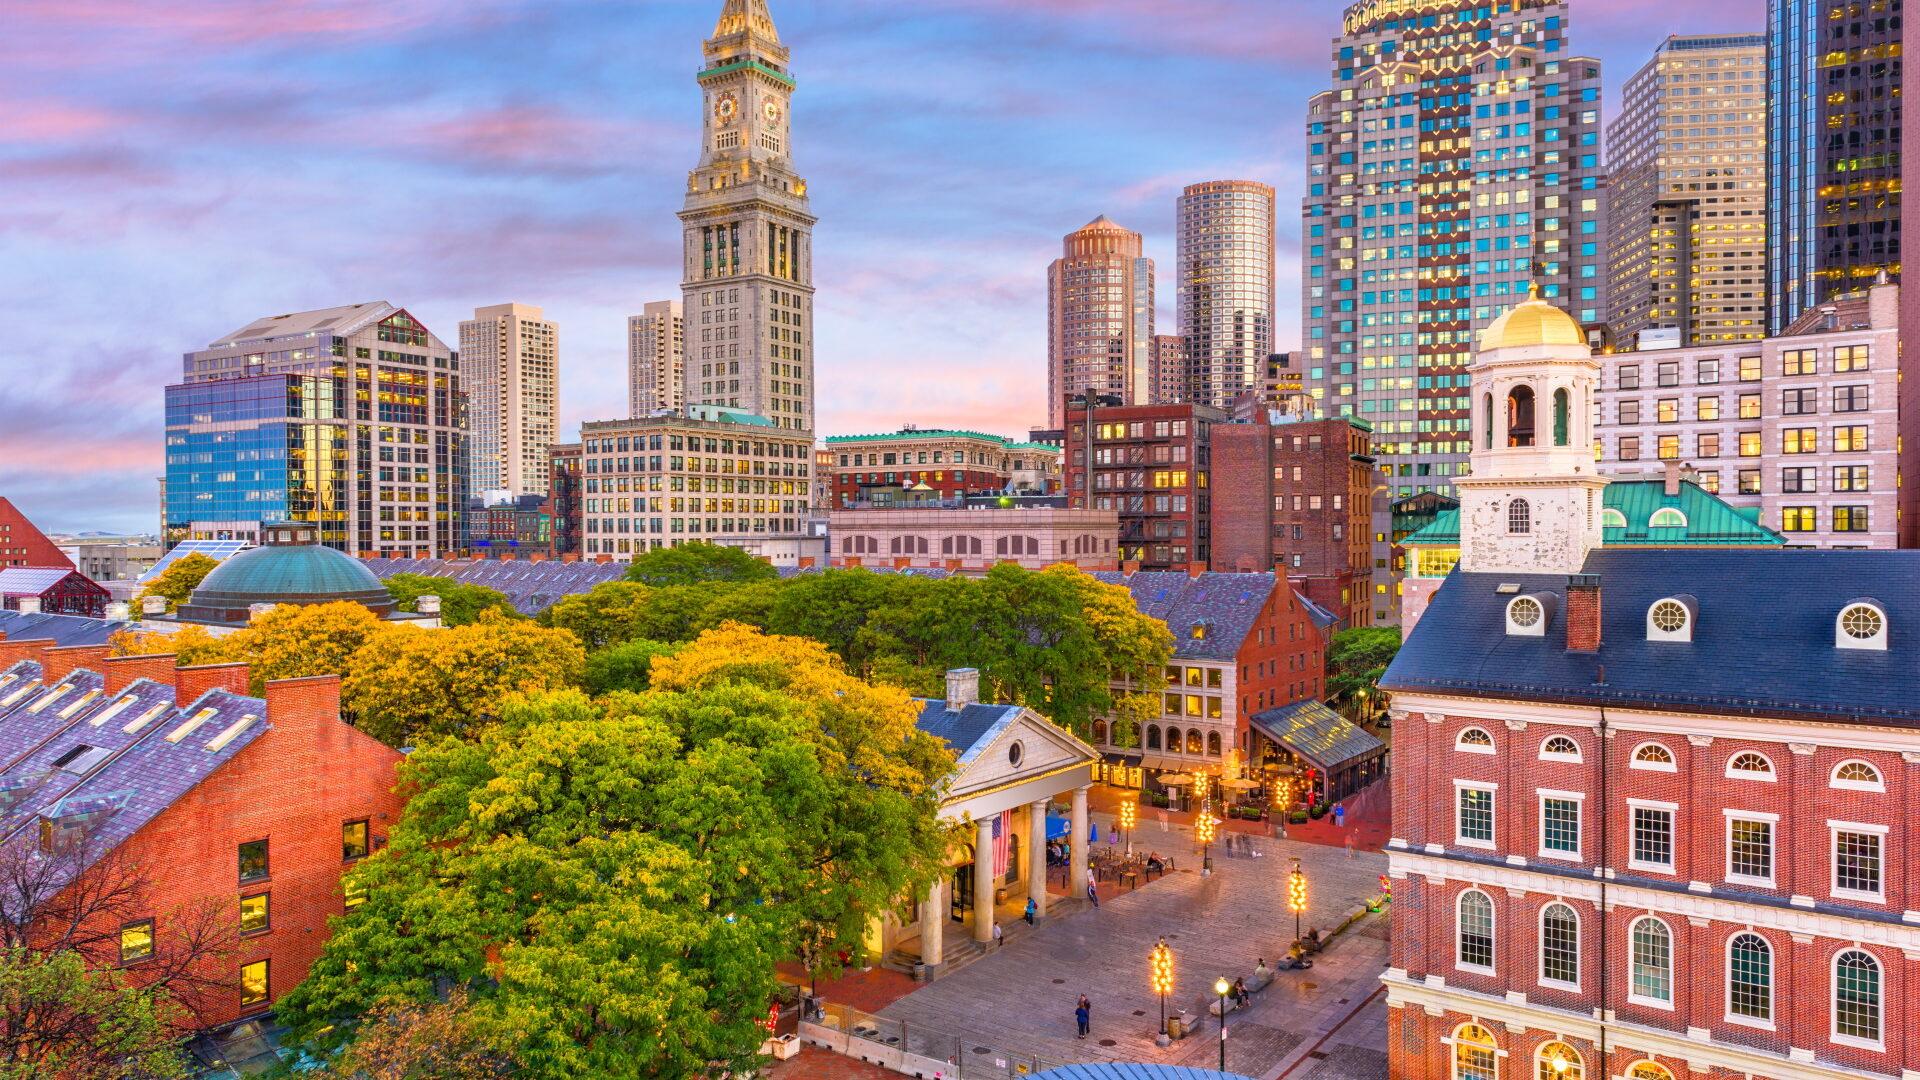 Frankfurt (FRA) – Boston (BOS)